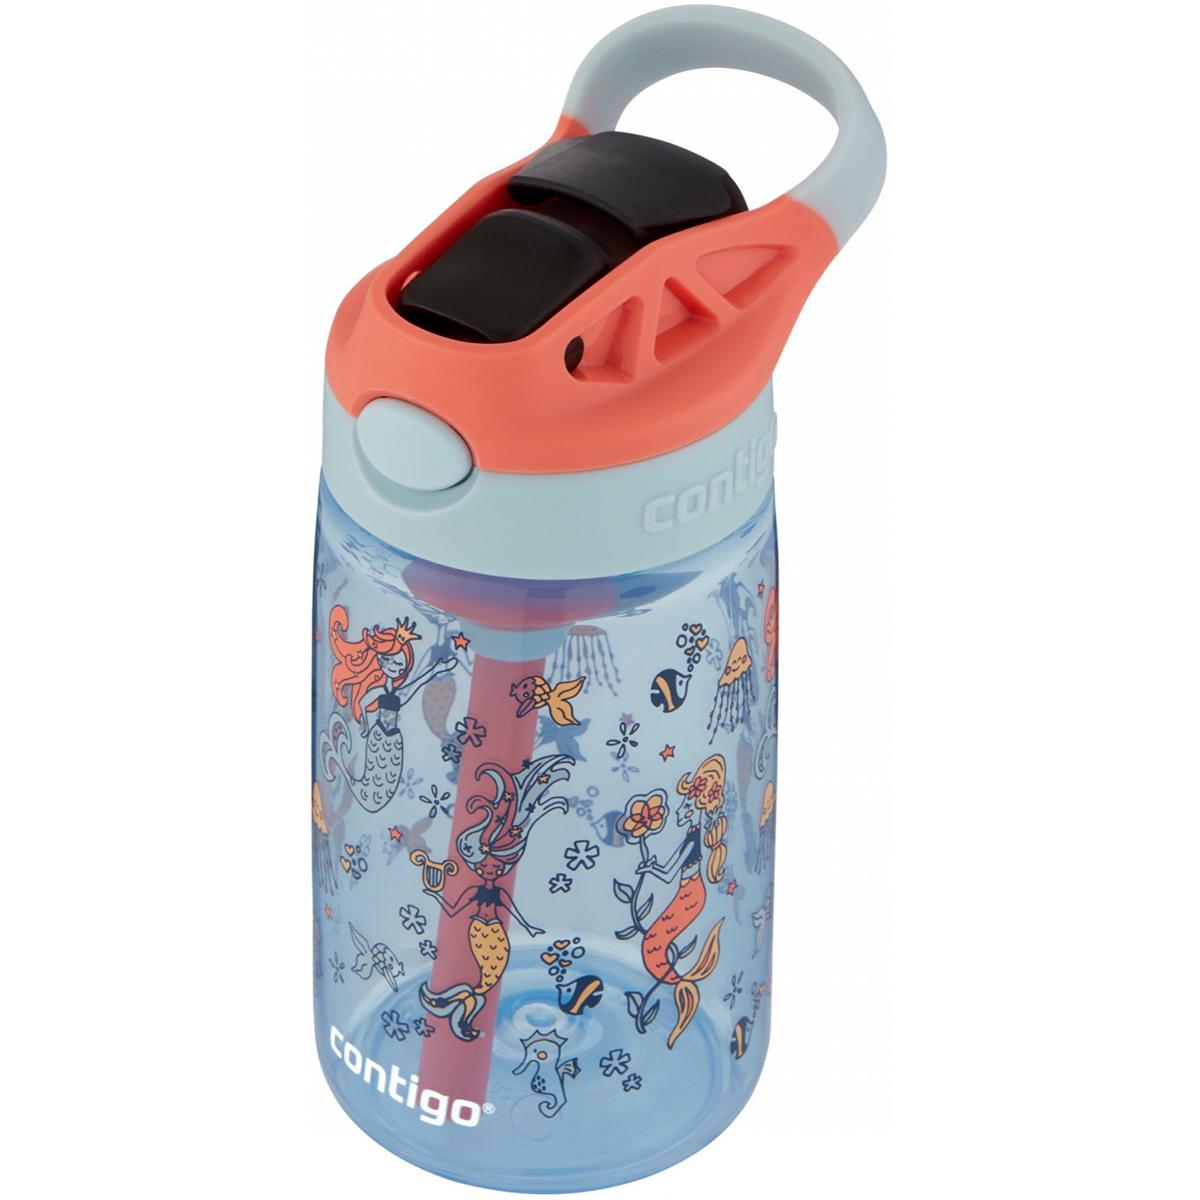 Contigo-Kid-039-s-14-oz-AutoSpout-Straw-Water-Bottle-with-Easy-Clean-Lid thumbnail 24